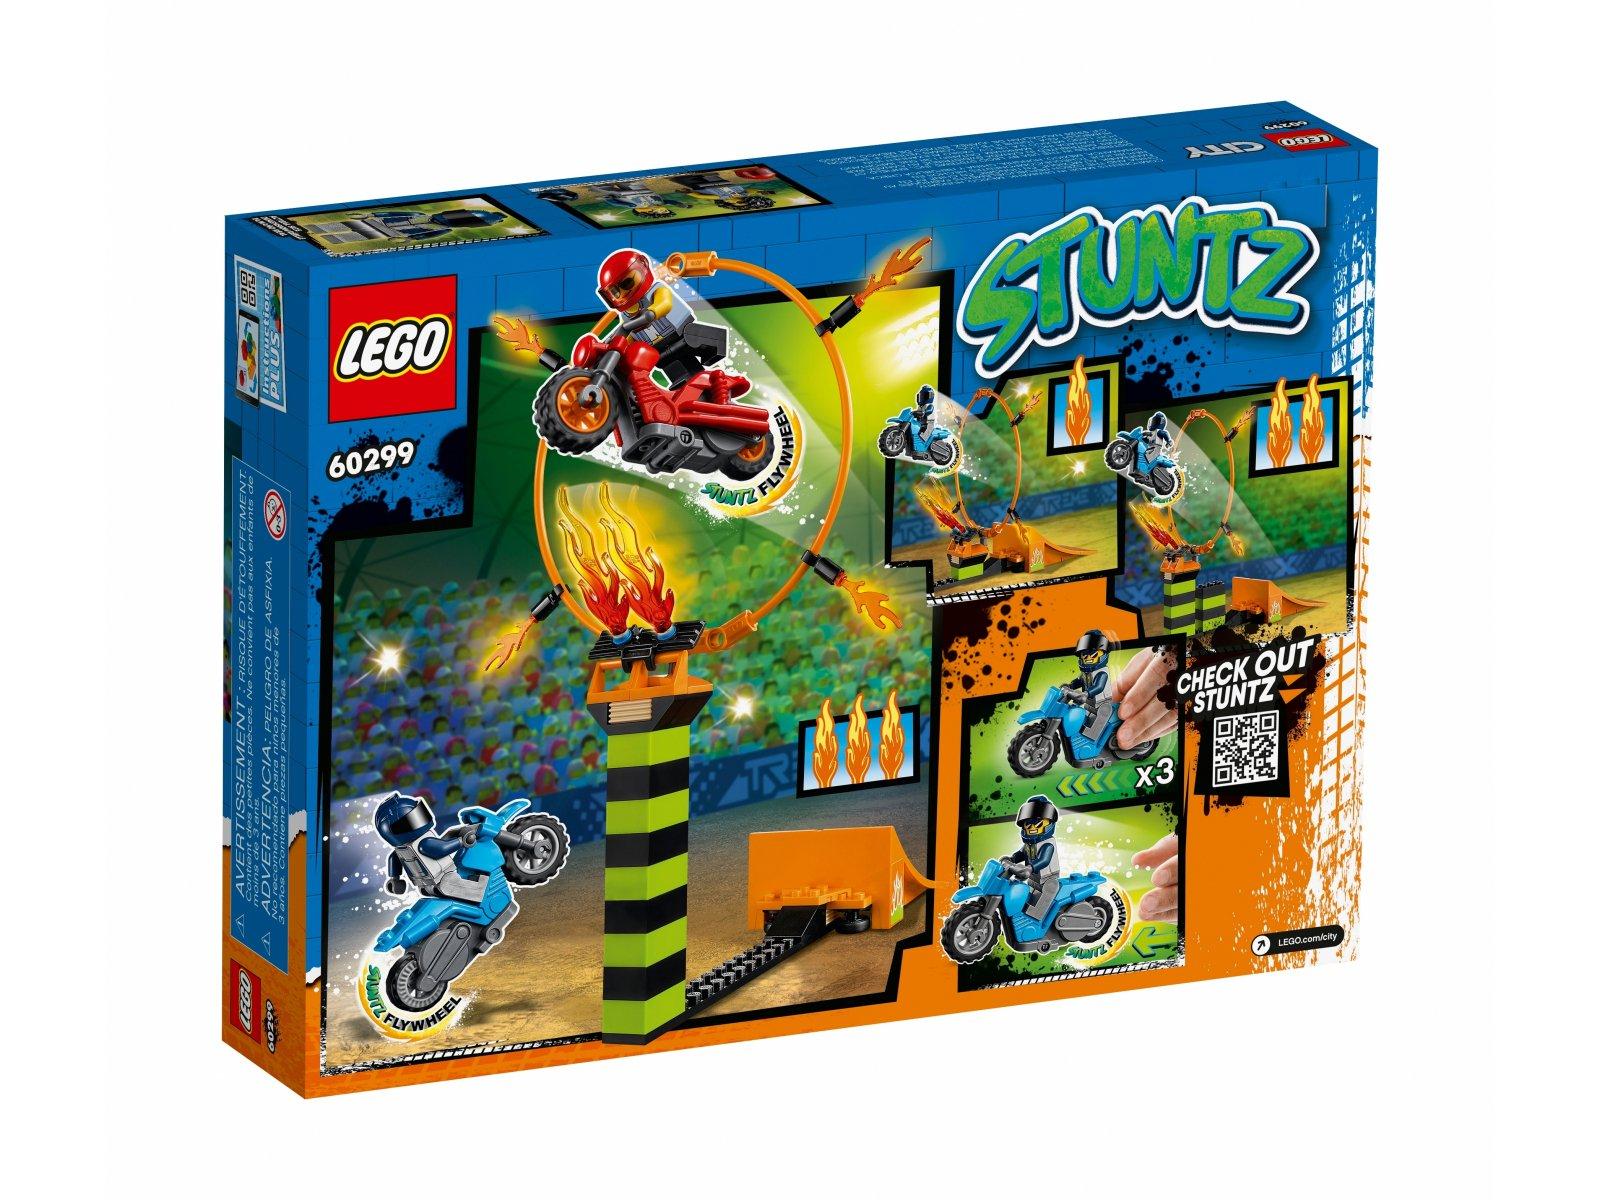 LEGO City 60299 Konkurs kaskaderski